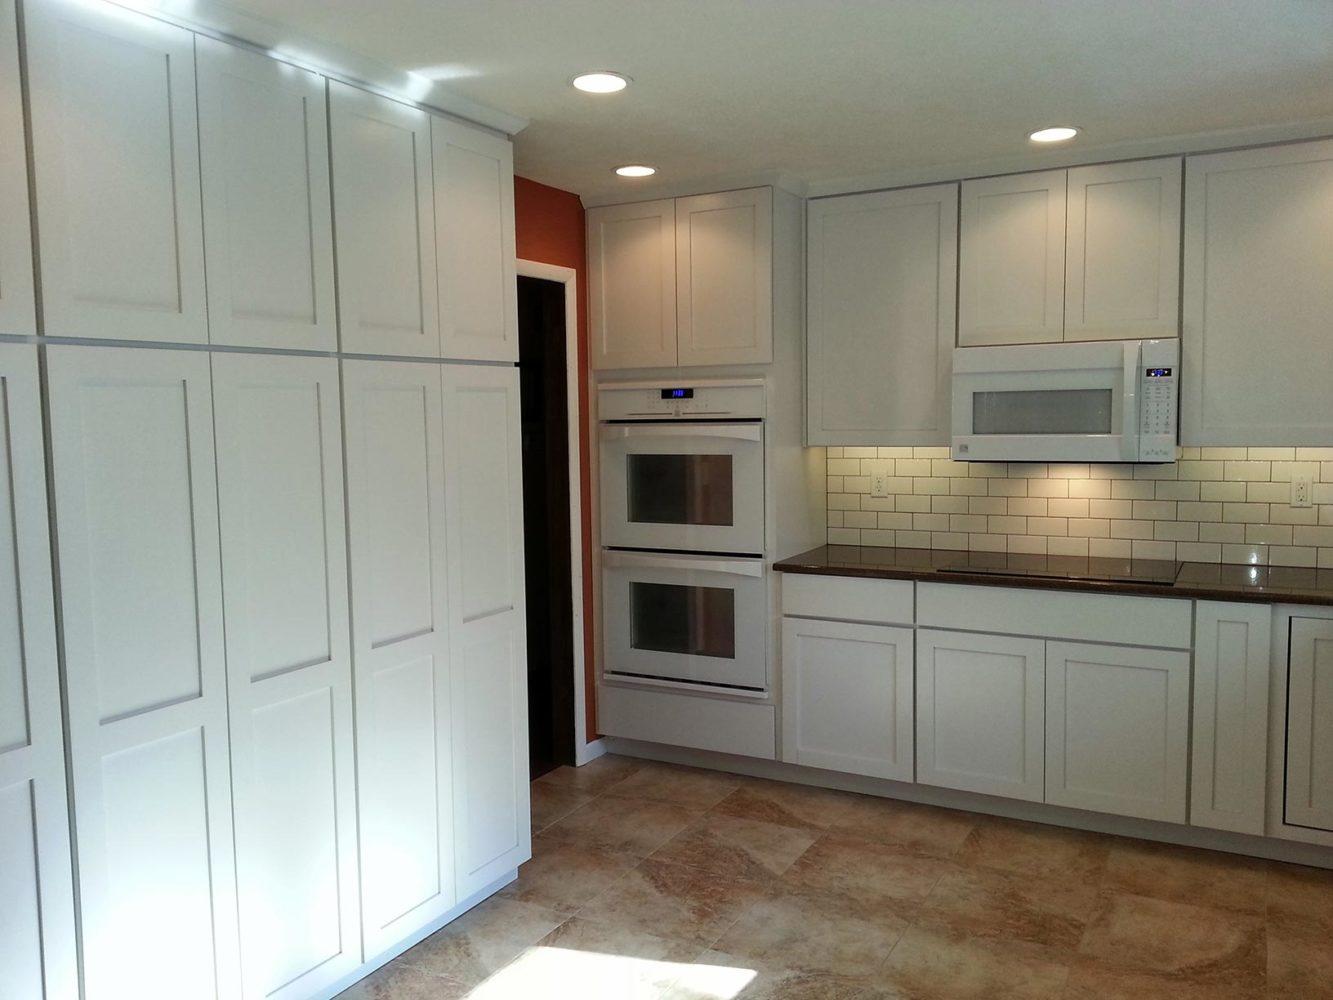 1970 S Kitchen Insideout Renovations